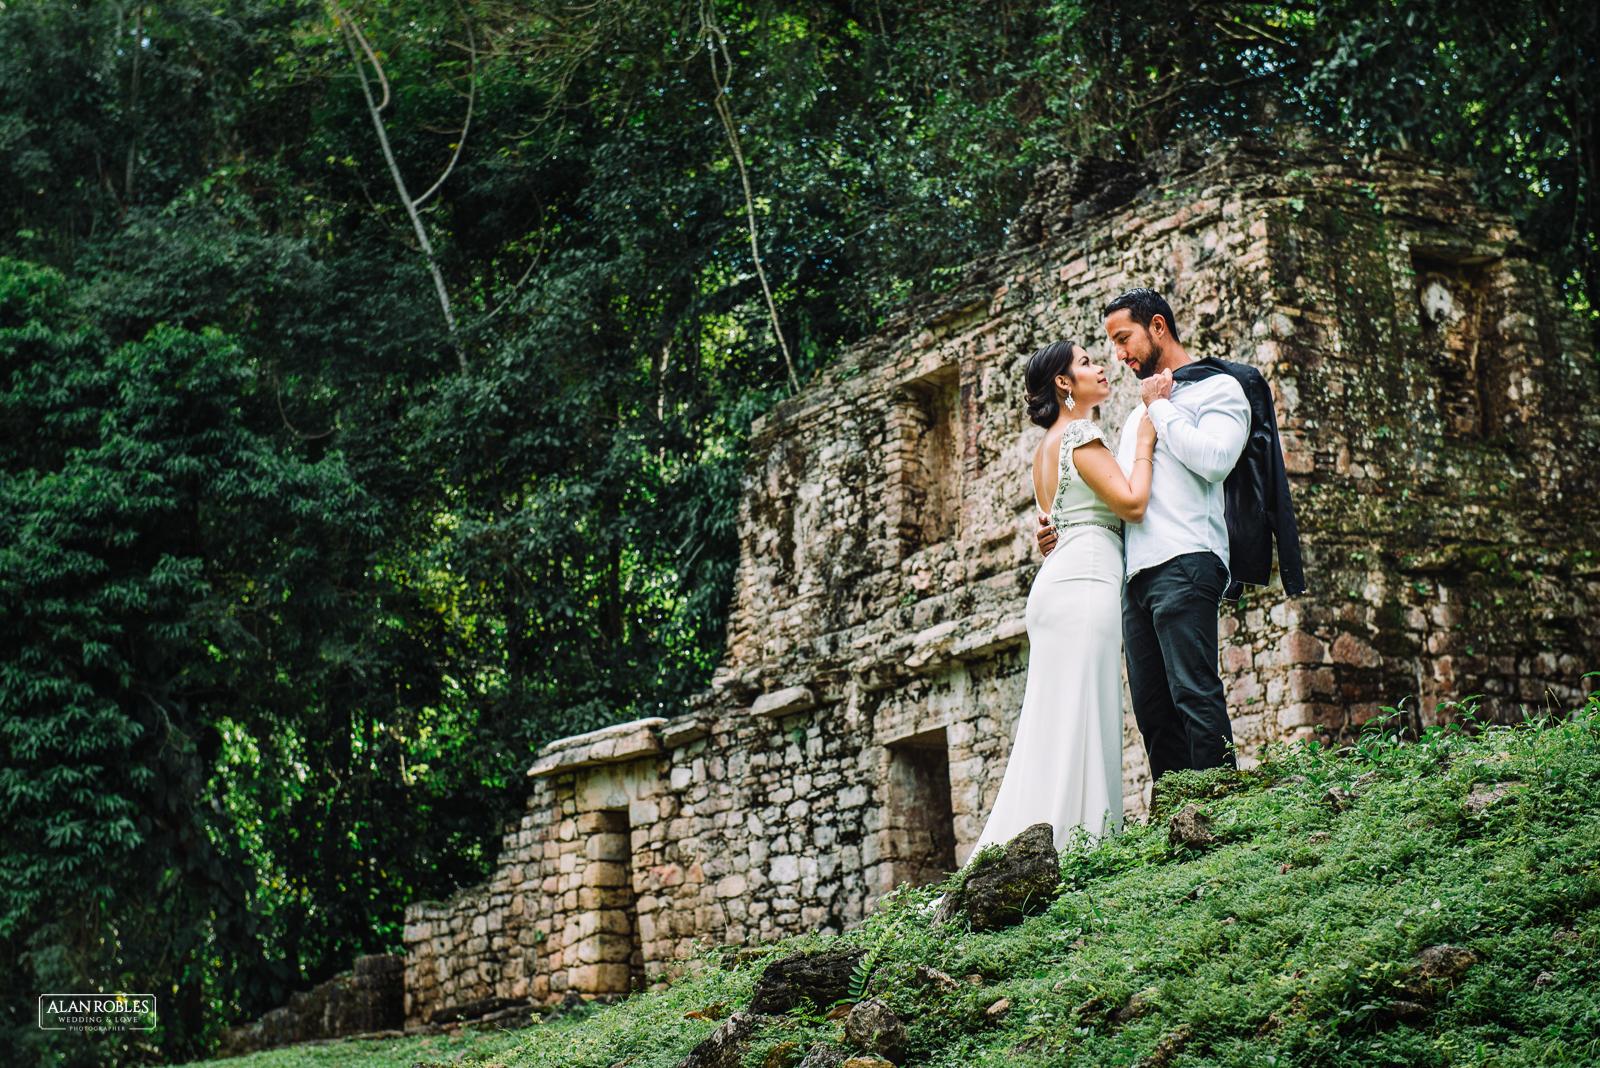 Fotografo de bodas Alan Robles-Pre boda Chiapas-27